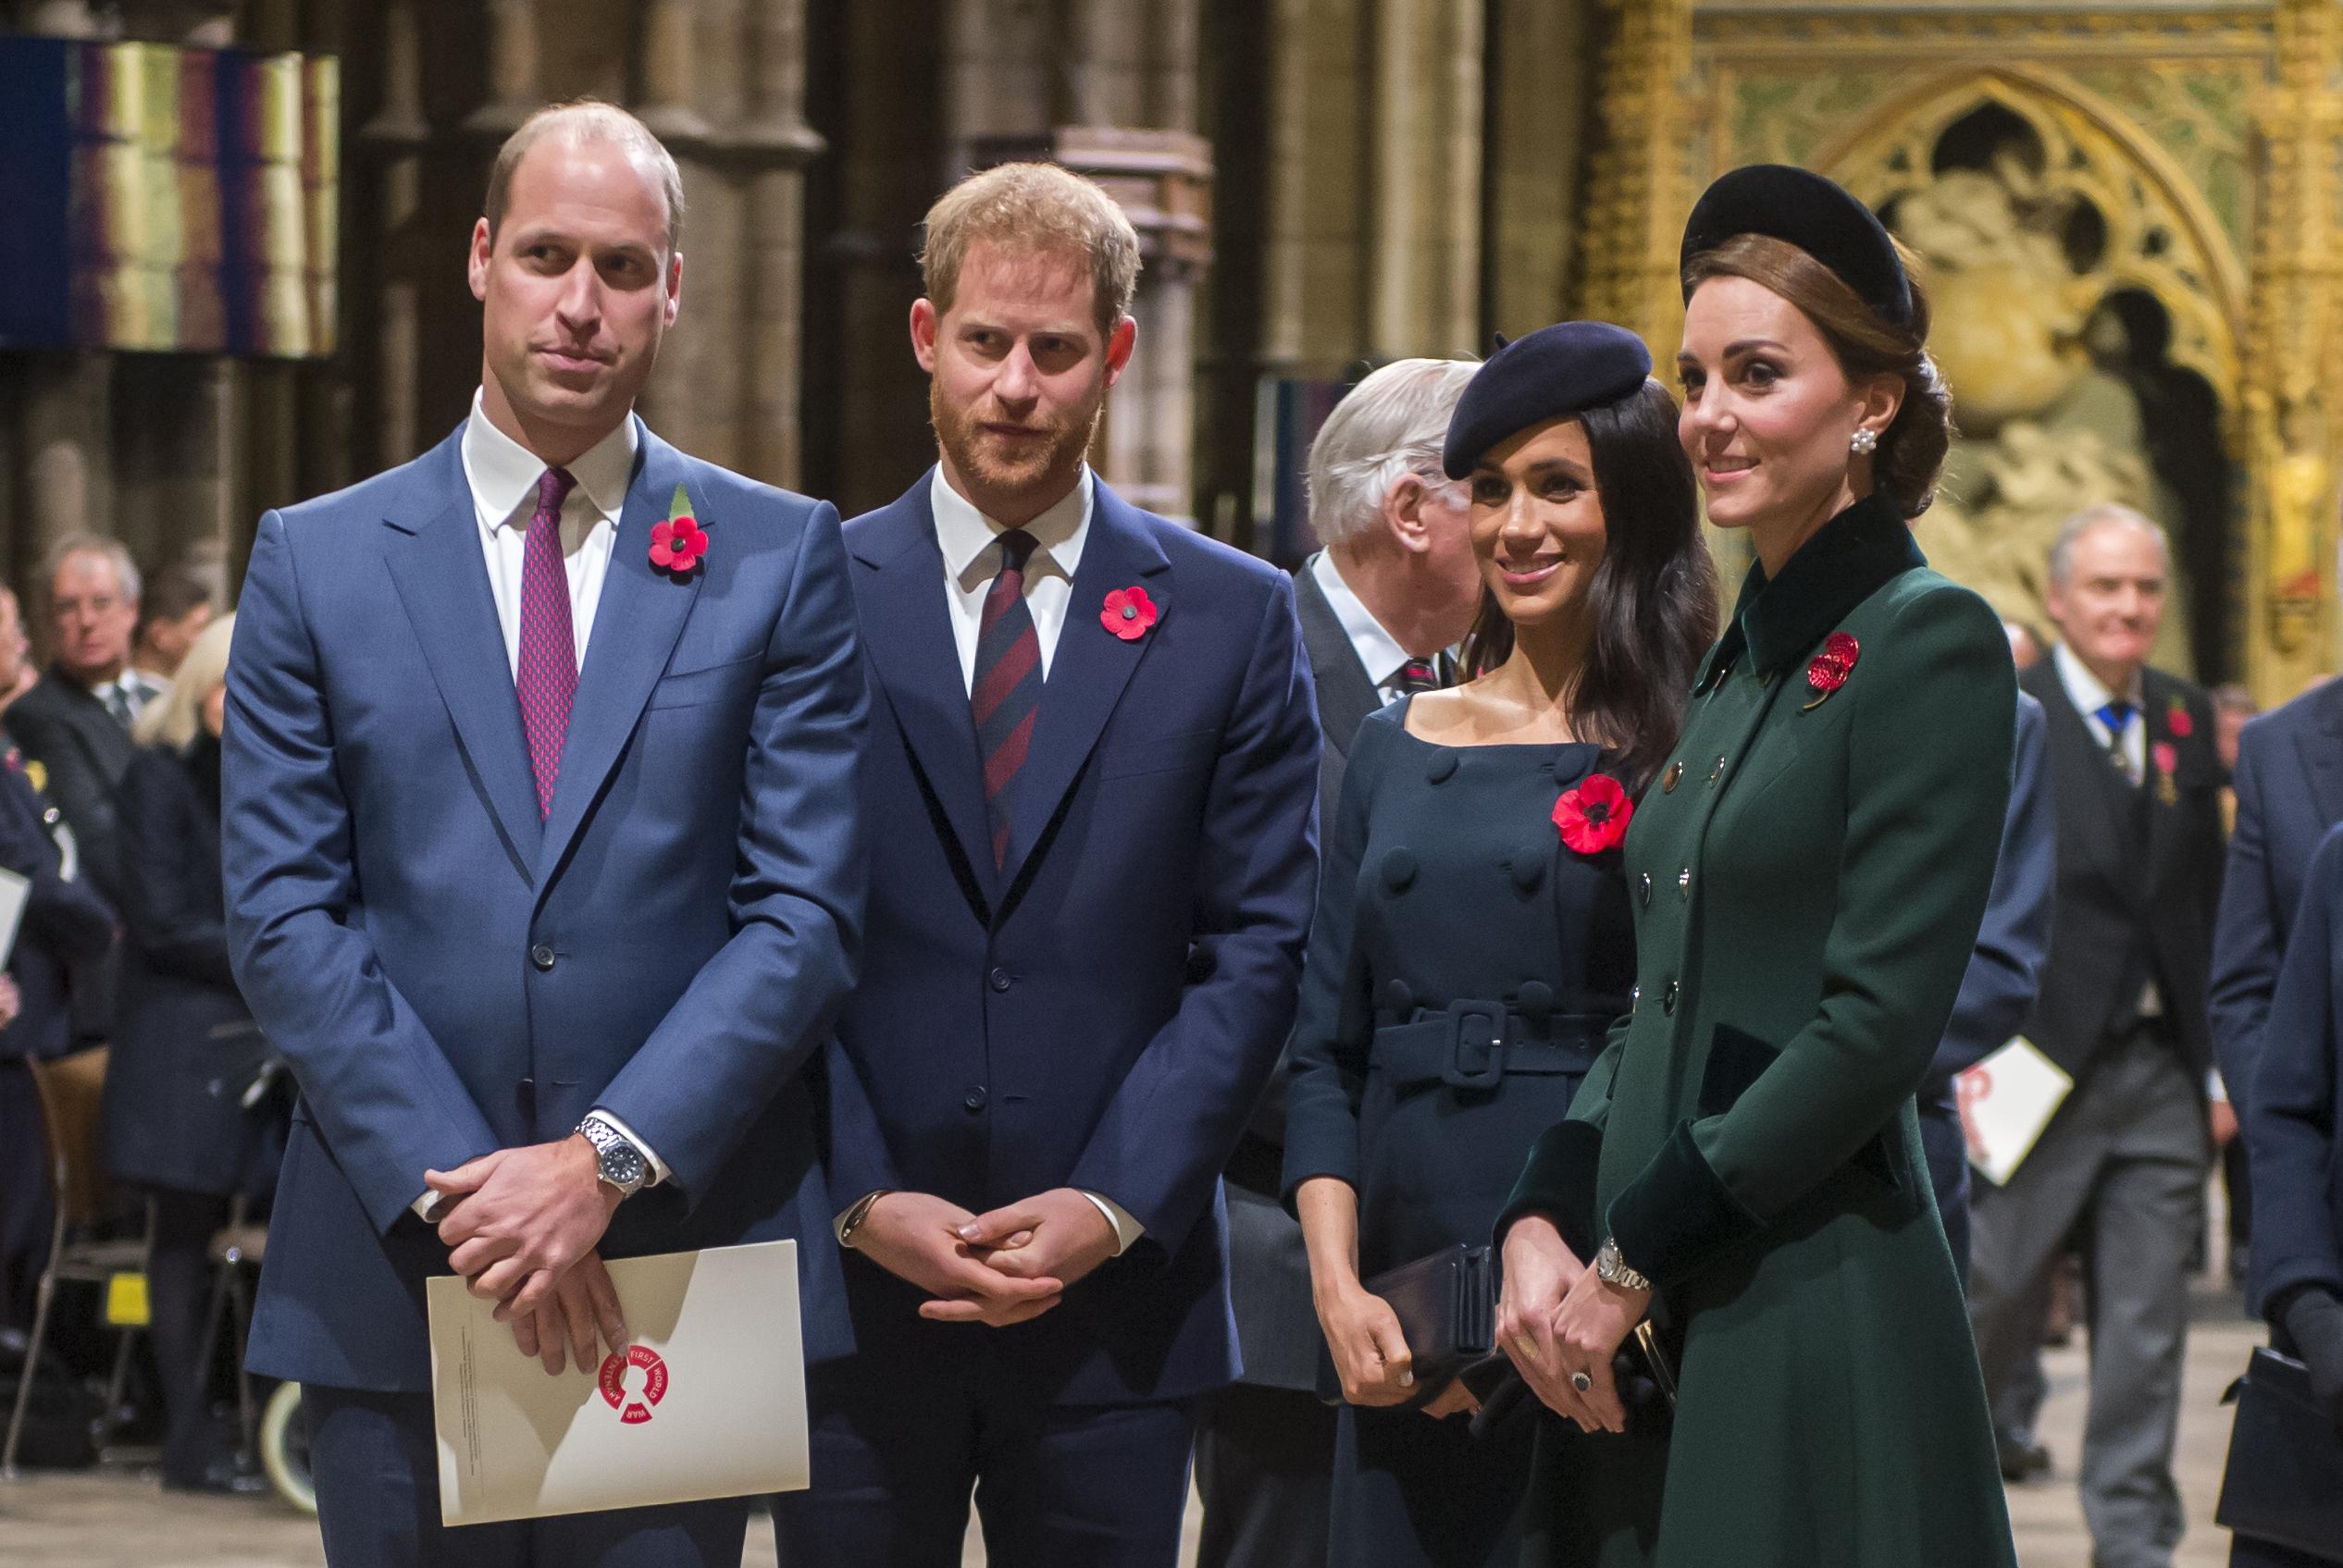 Uk Princes William, Harry Denounce 'offensive' Newspaper Report